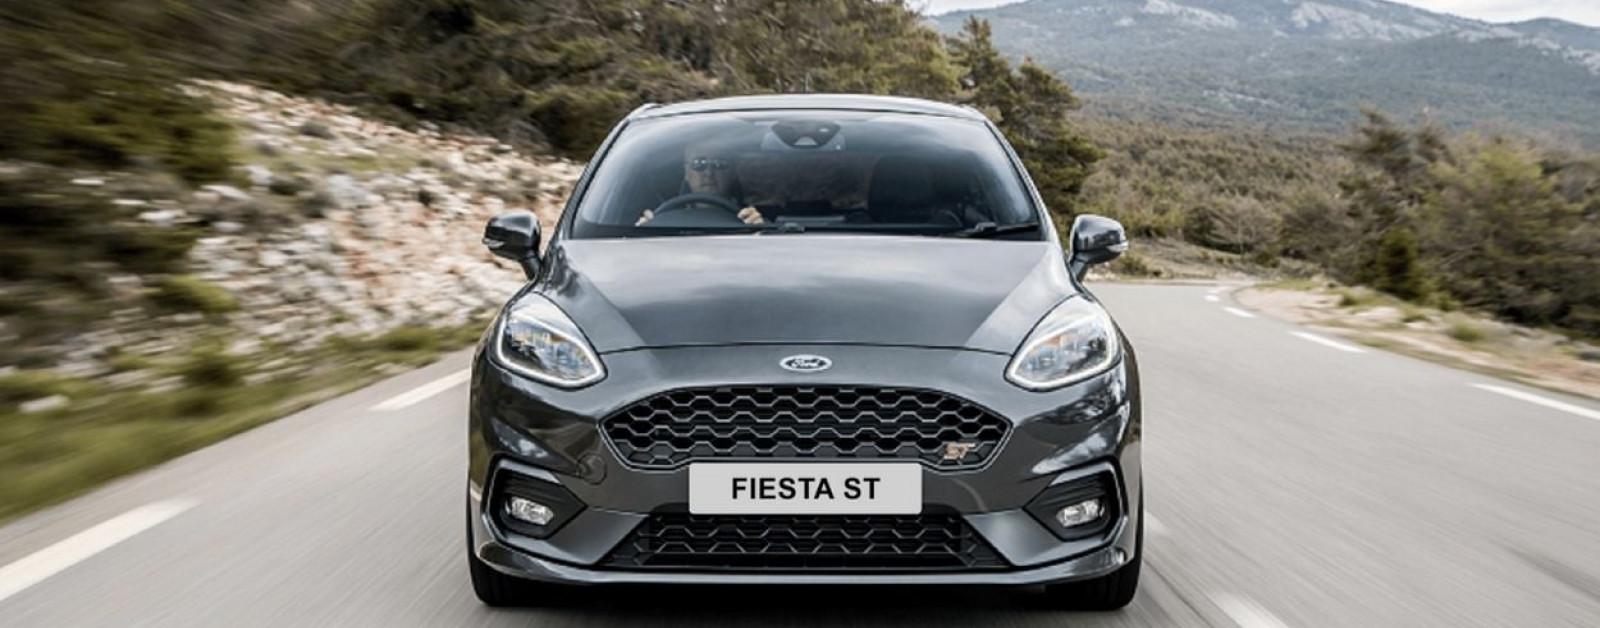 Fiesta ST